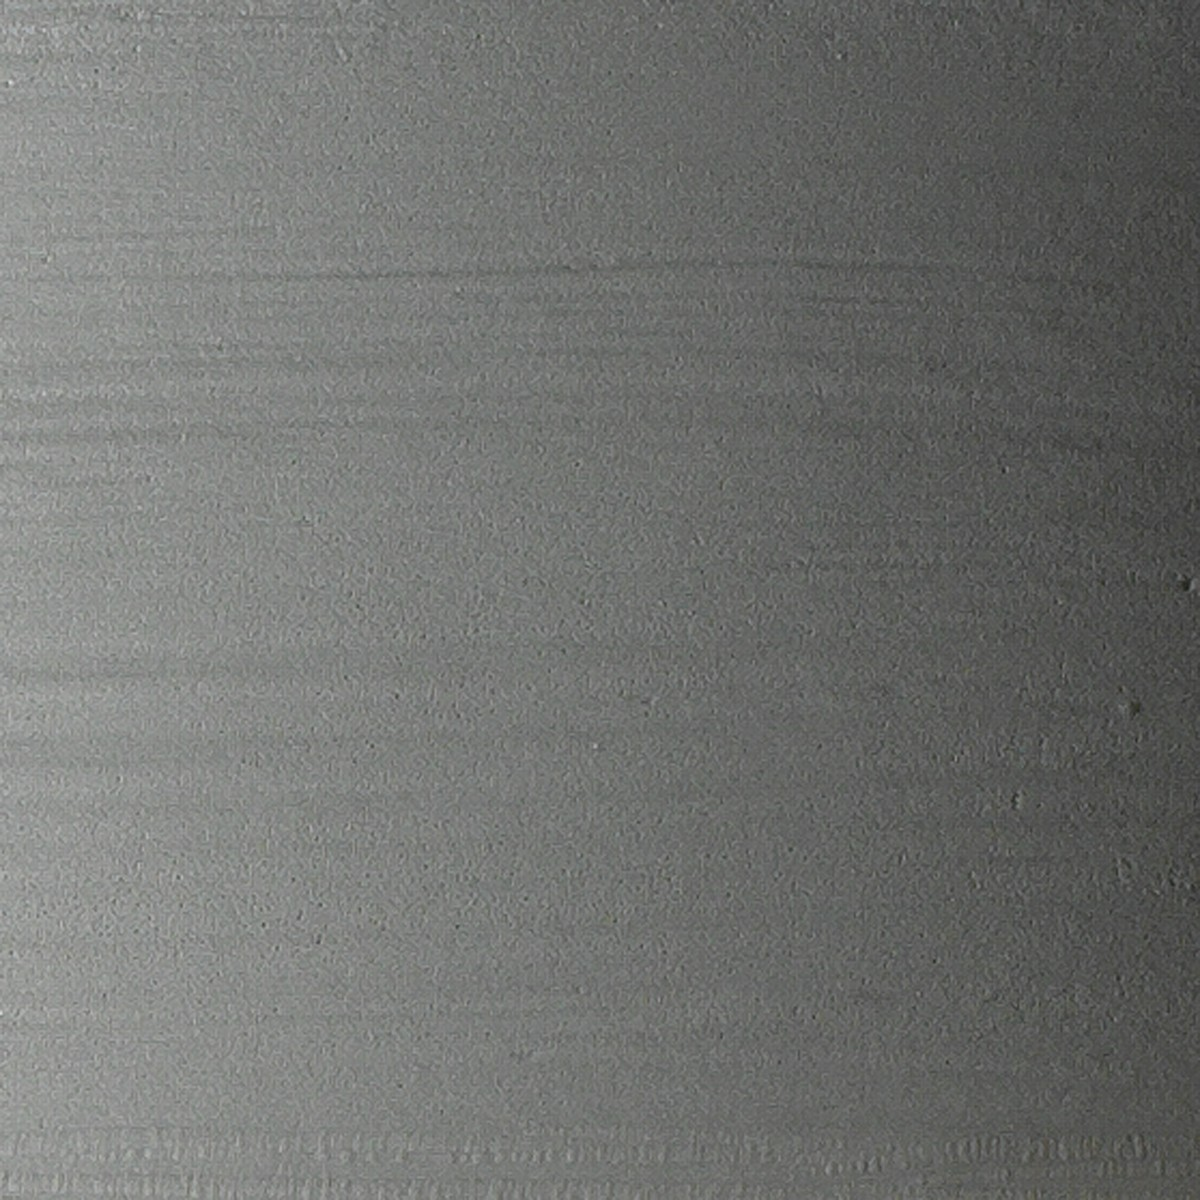 Marset Soho C 38 LED Deckenleuchte, steingrau